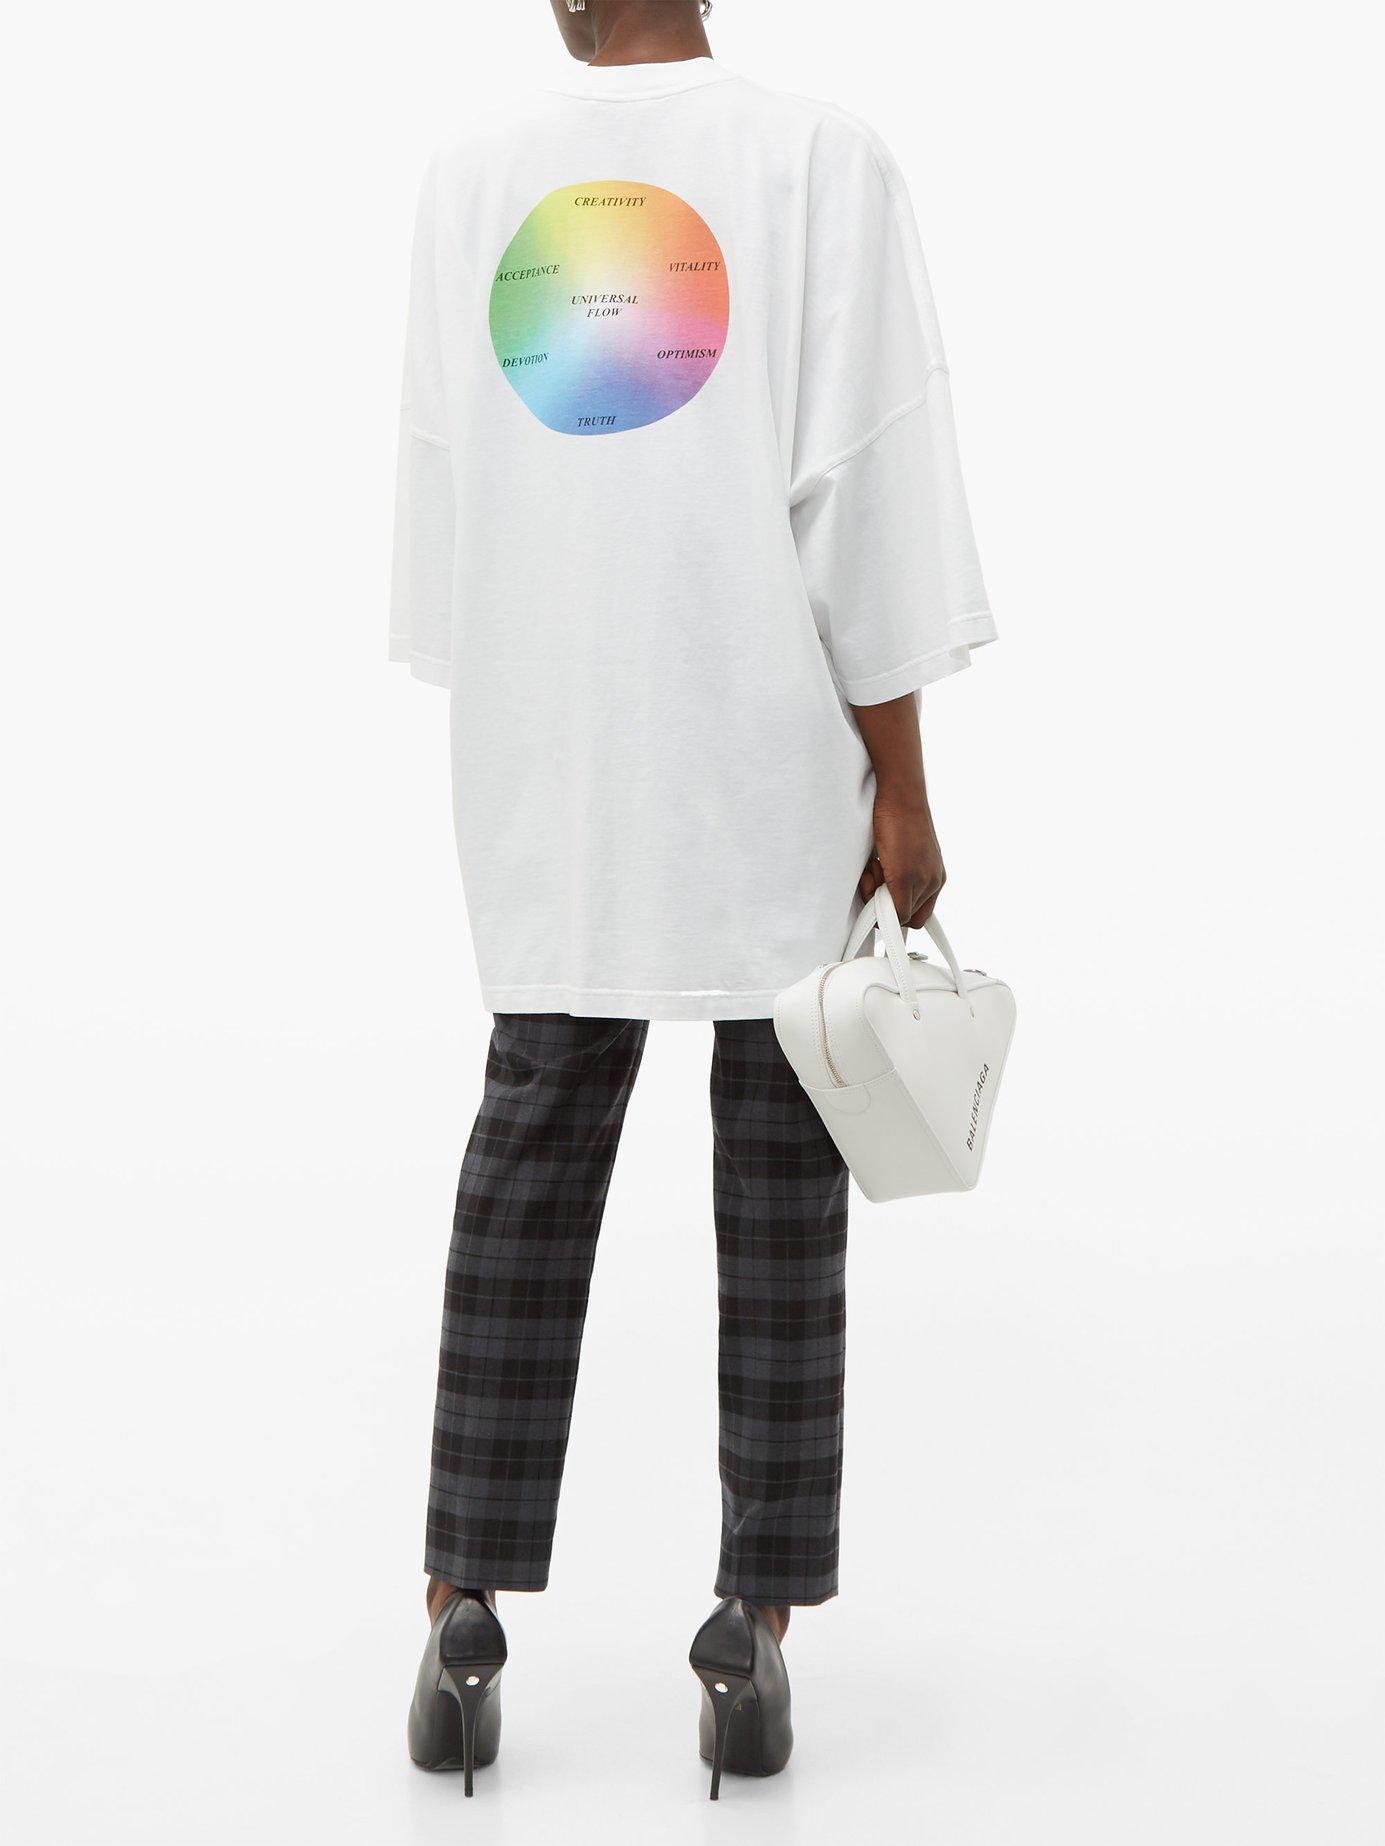 Universal Flow cotton T-shirt by Balenciaga